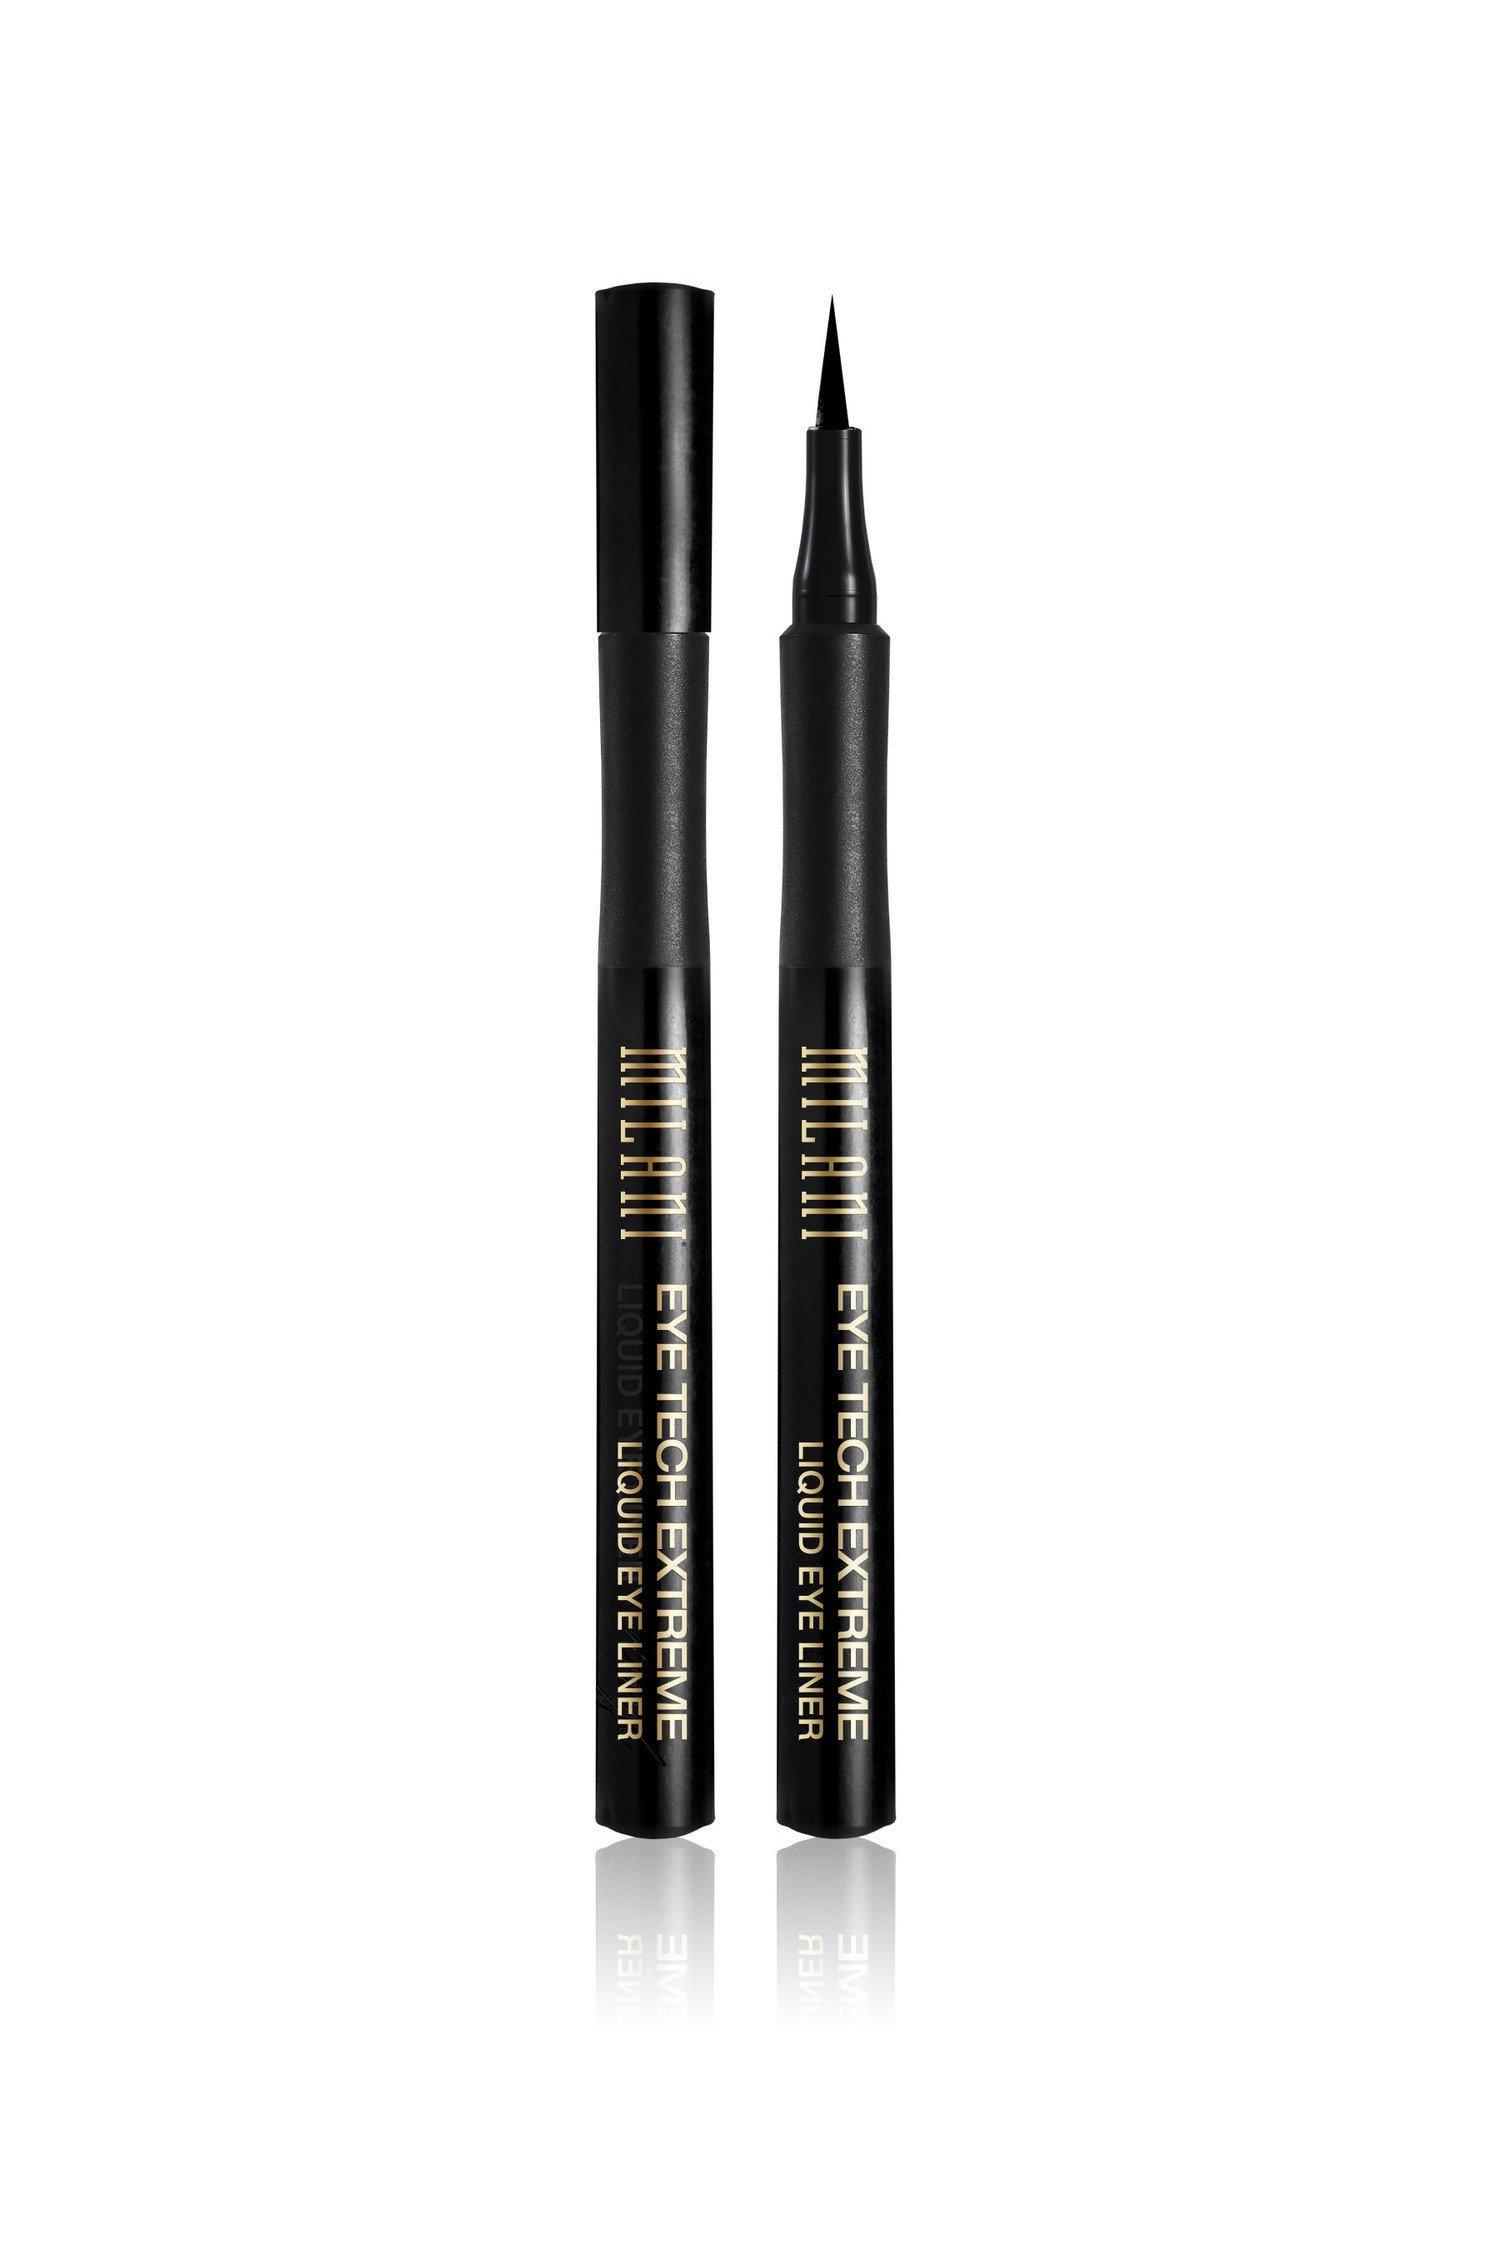 Milani Eye Tech Extreme Liquid Eye Liner, Blackest Black .033 Fl.Oz./1ML